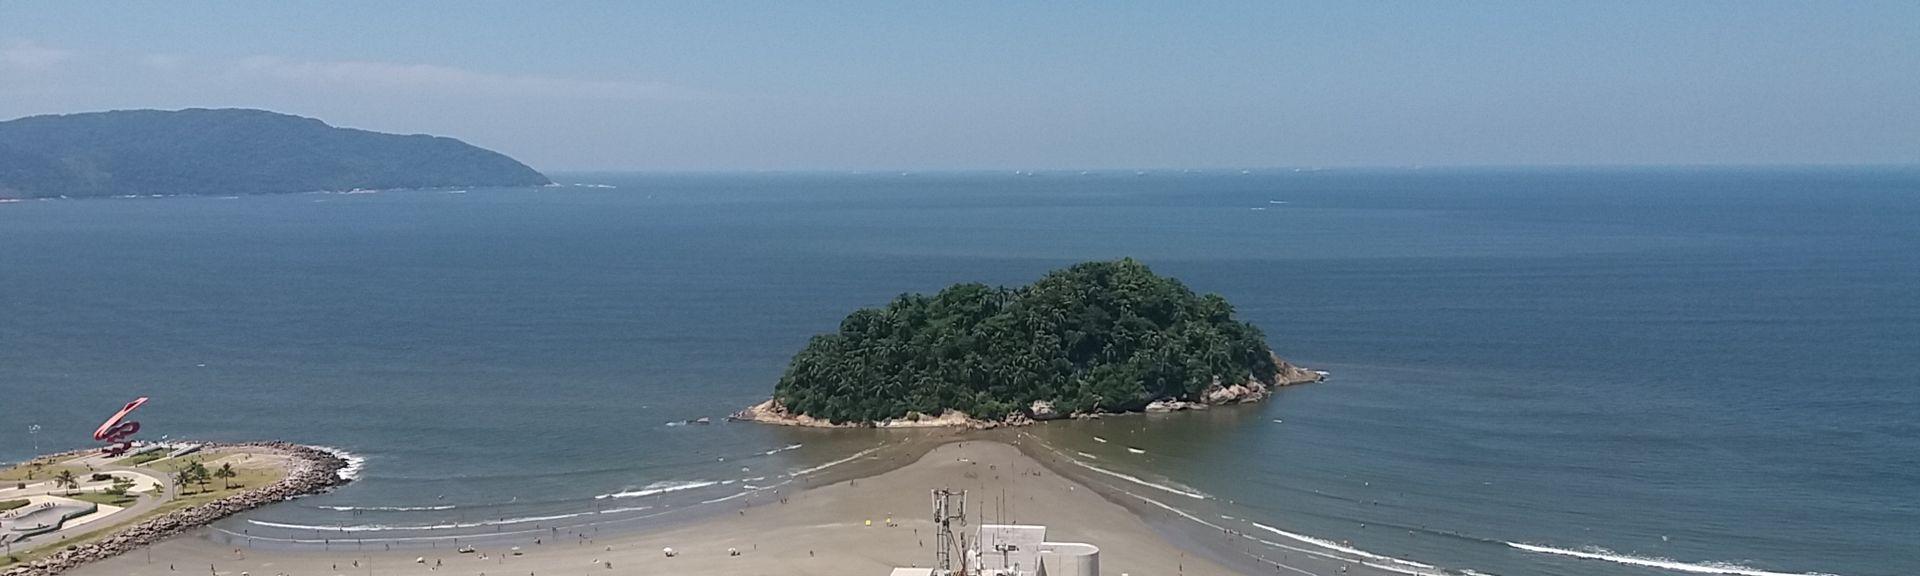 Enseada Beach, Guaruja, Southeast Region, Brazil